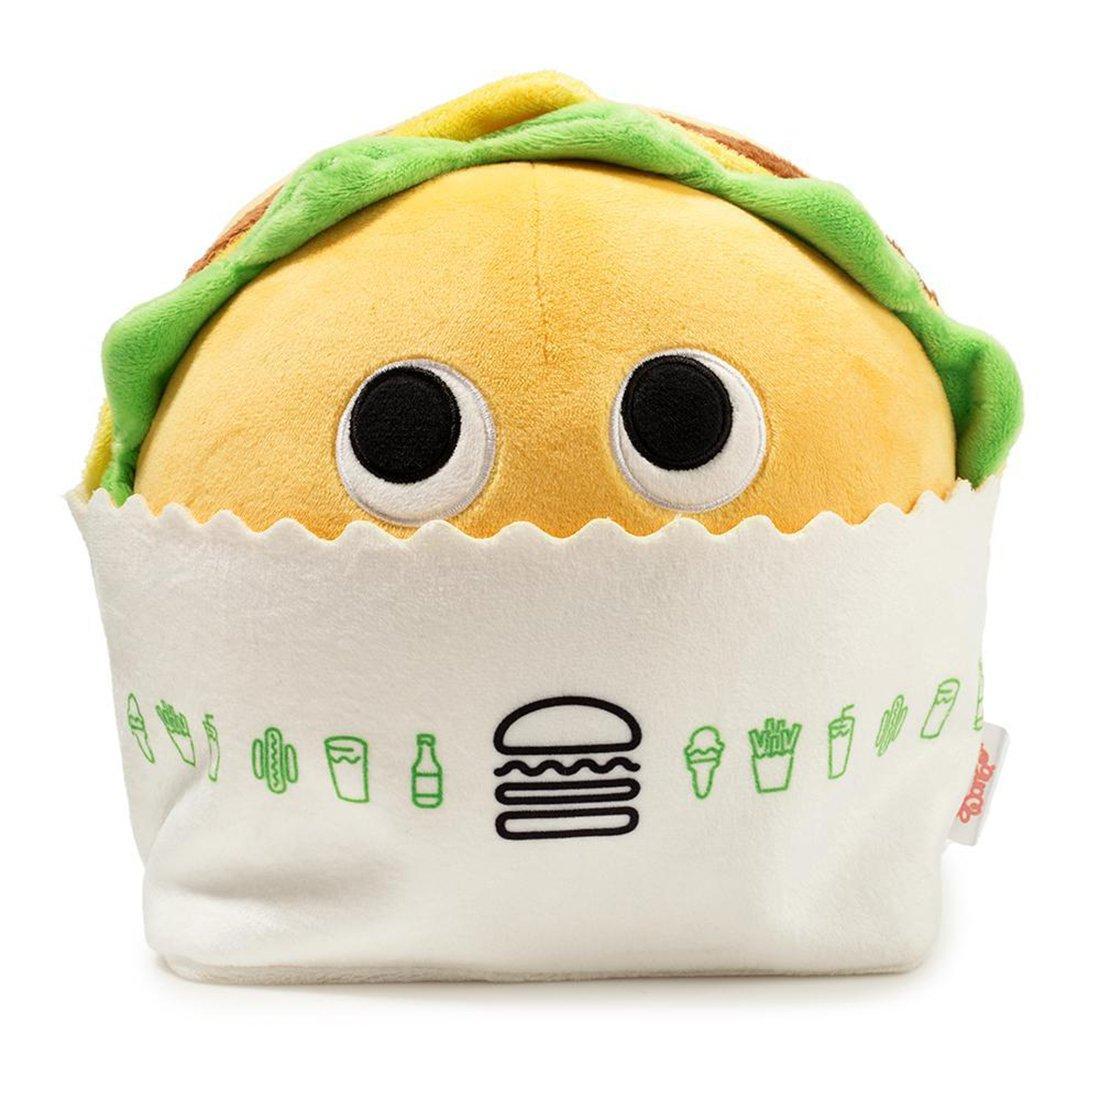 : ~8 Yummy World Plush Shake Shack Exclusive Kidrobot Shack Burger 1 Official Yummy Mini-Item Goodie Bundle BCC94P544